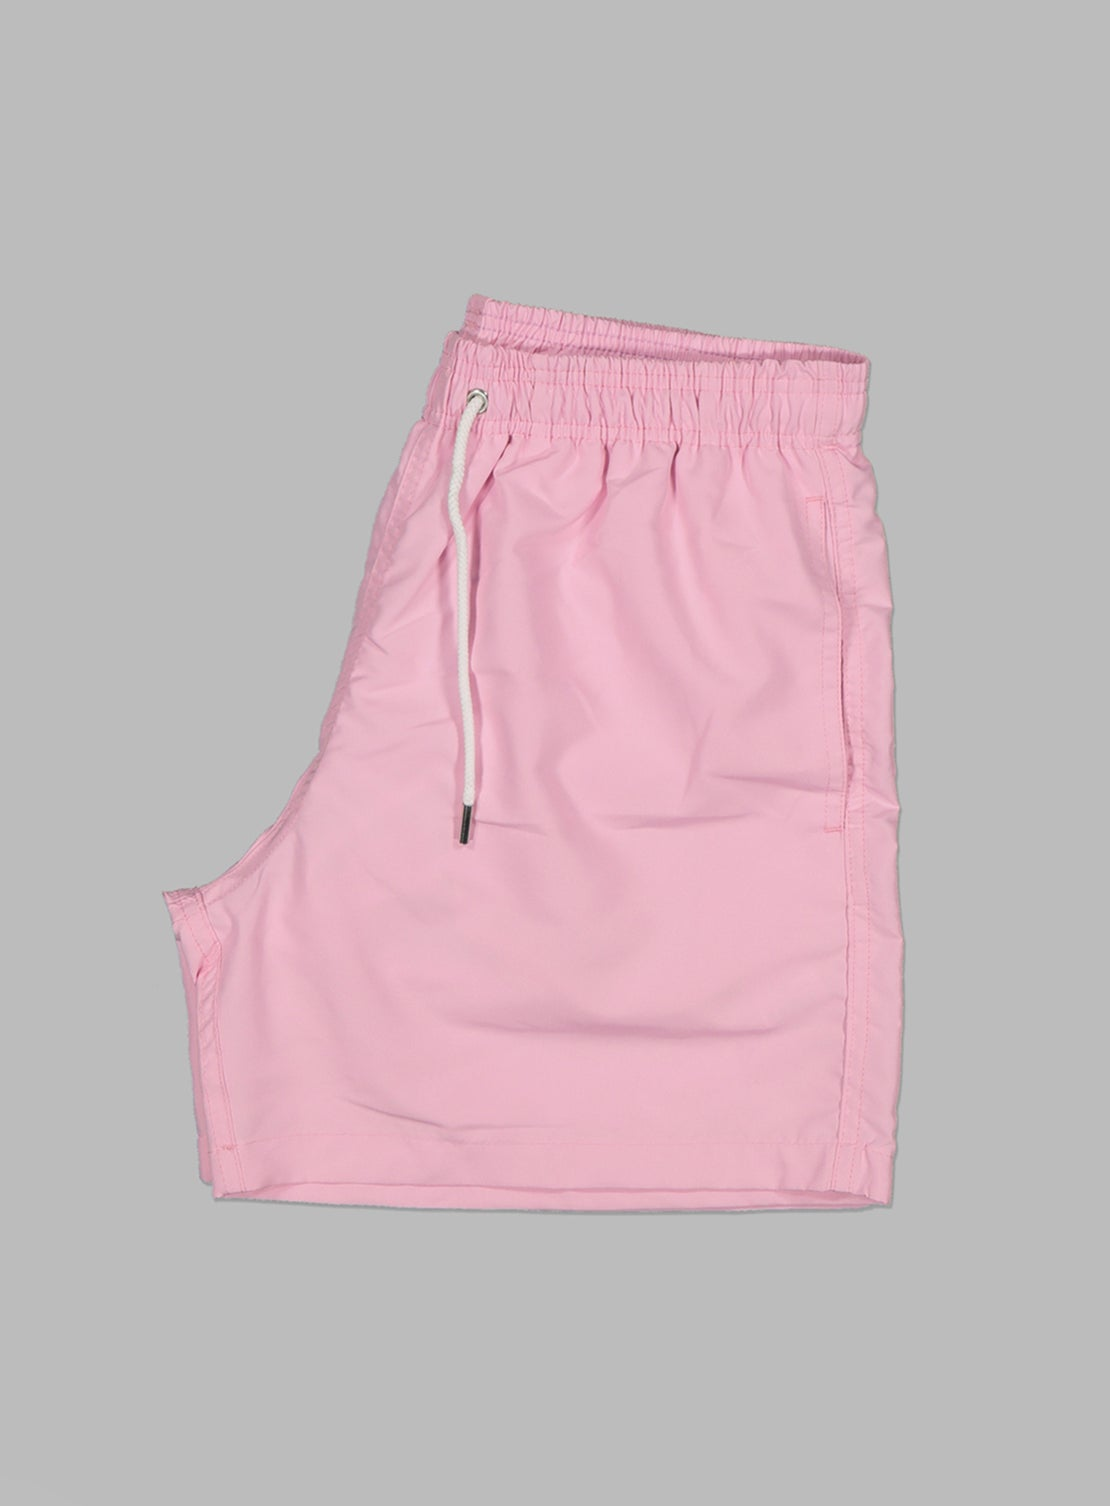 Pale Pink Swim Trunks